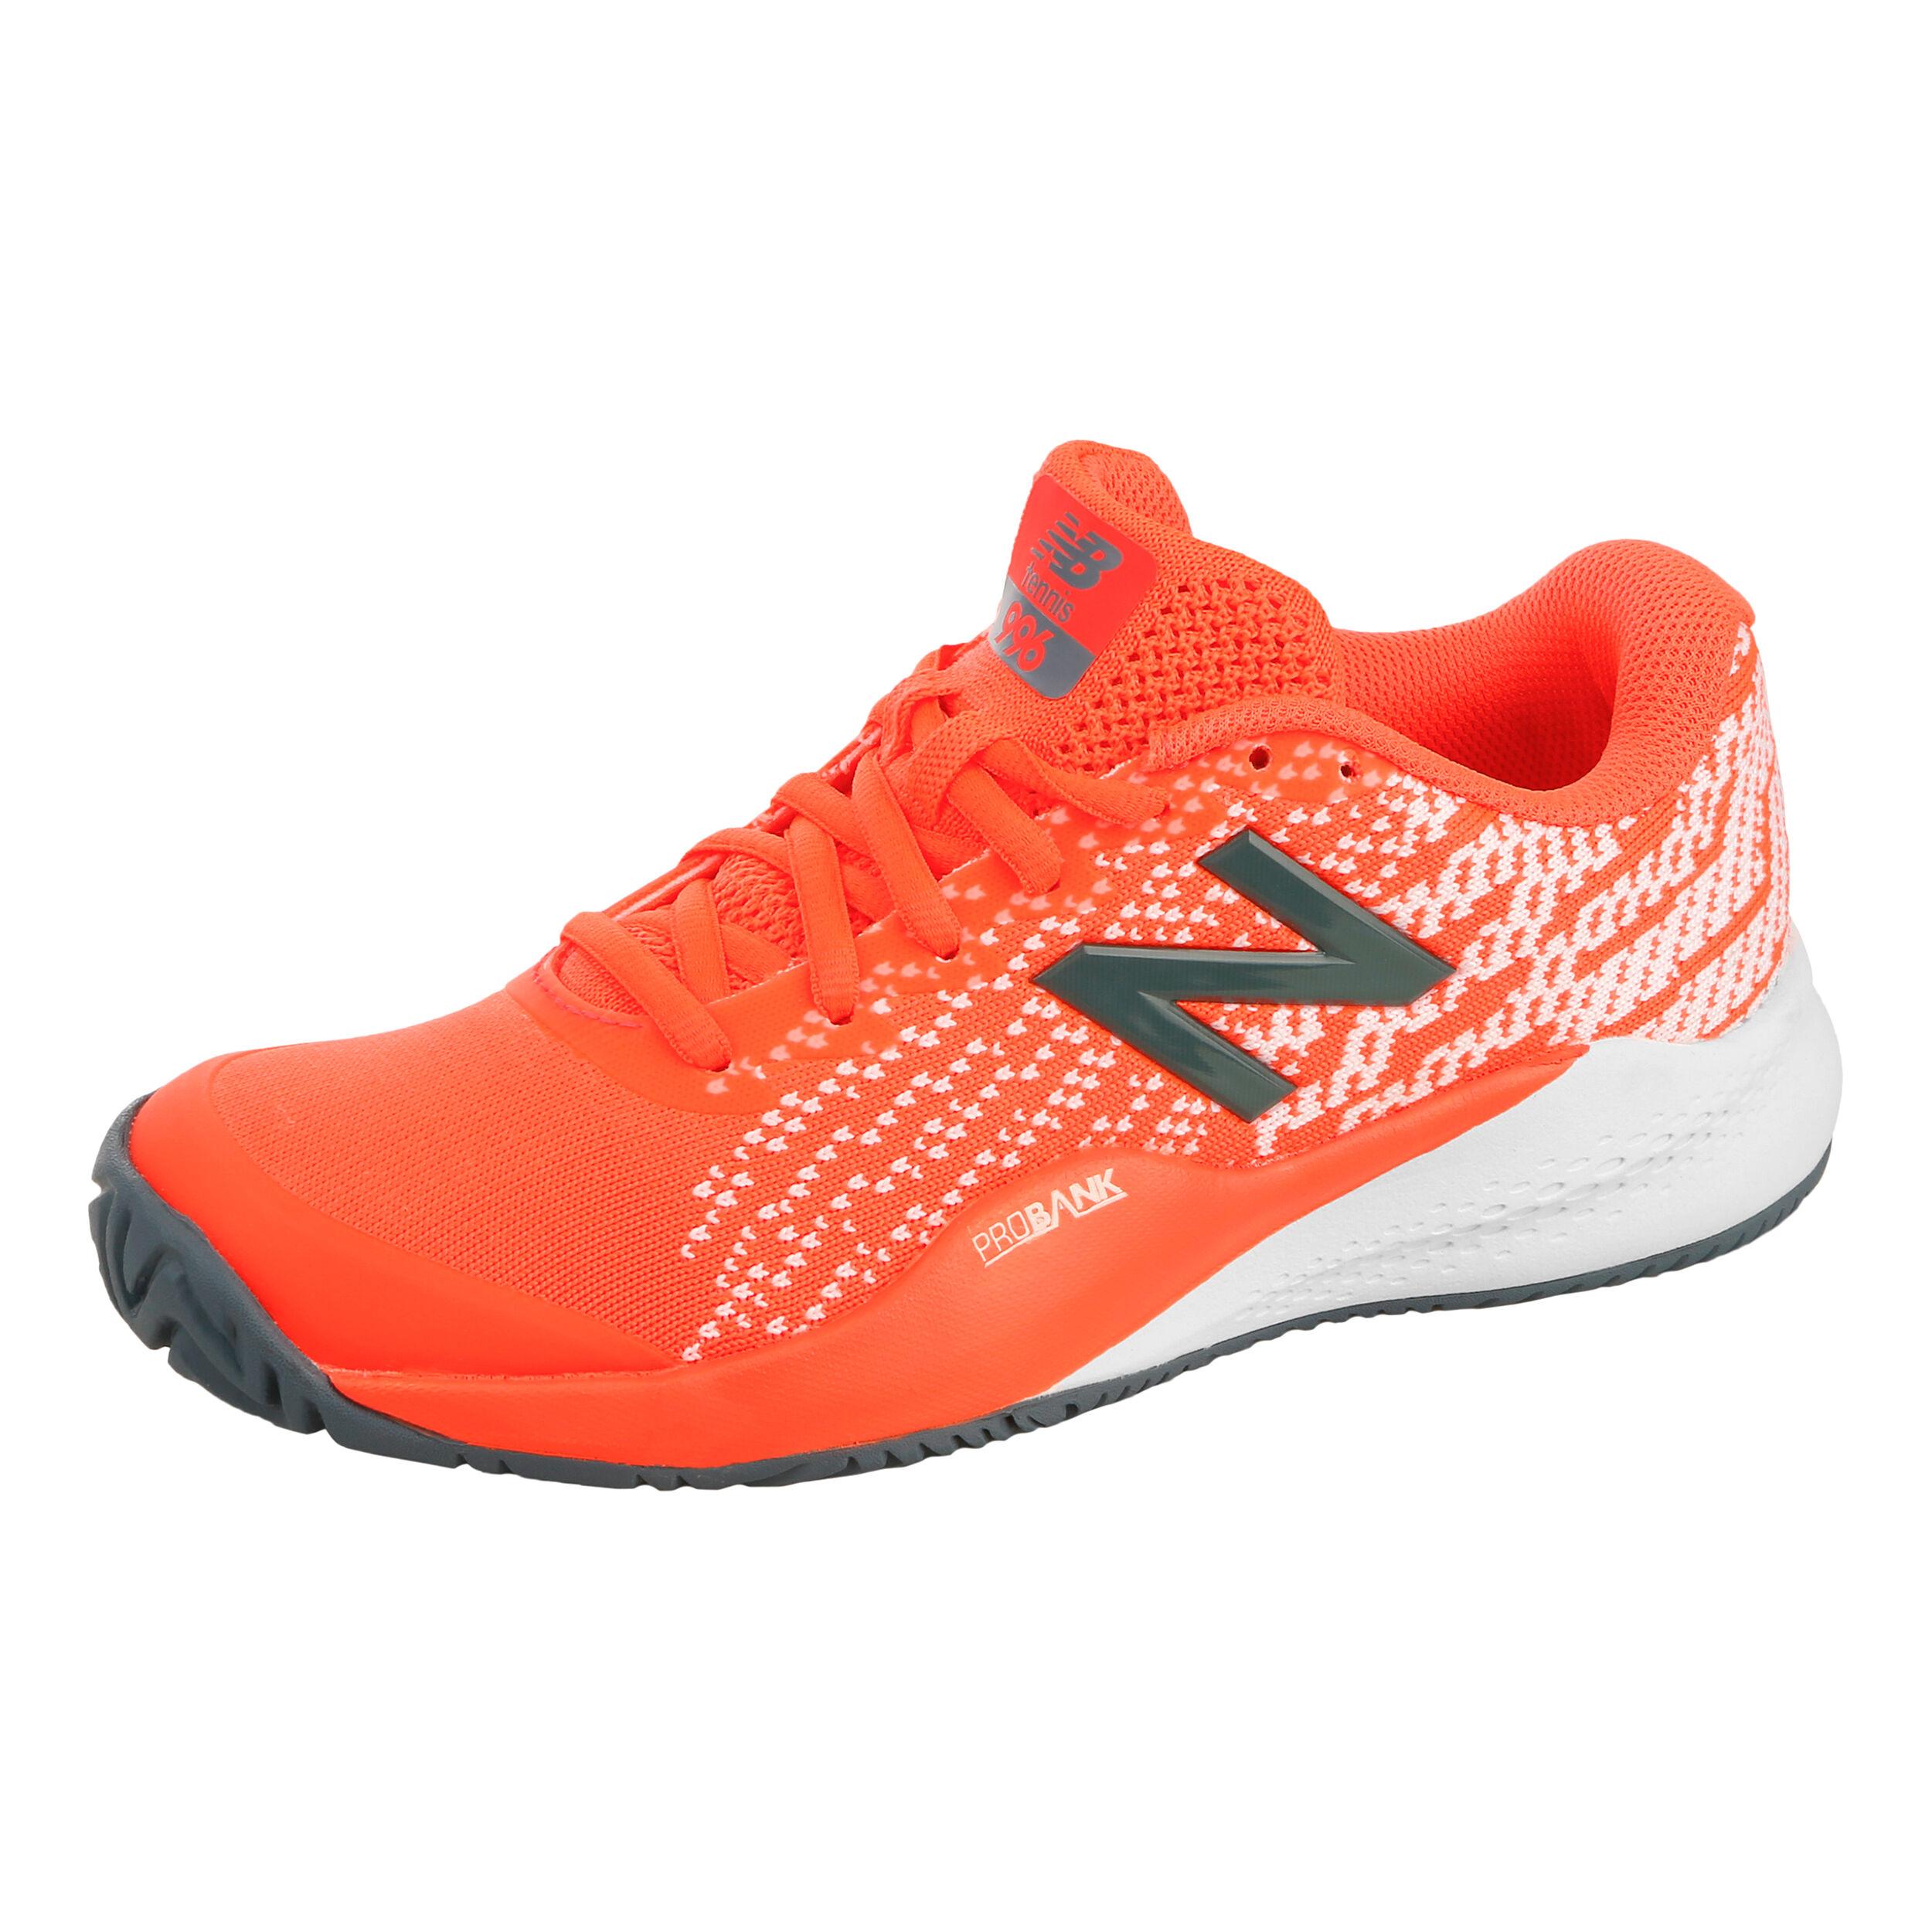 996 new balance naranja